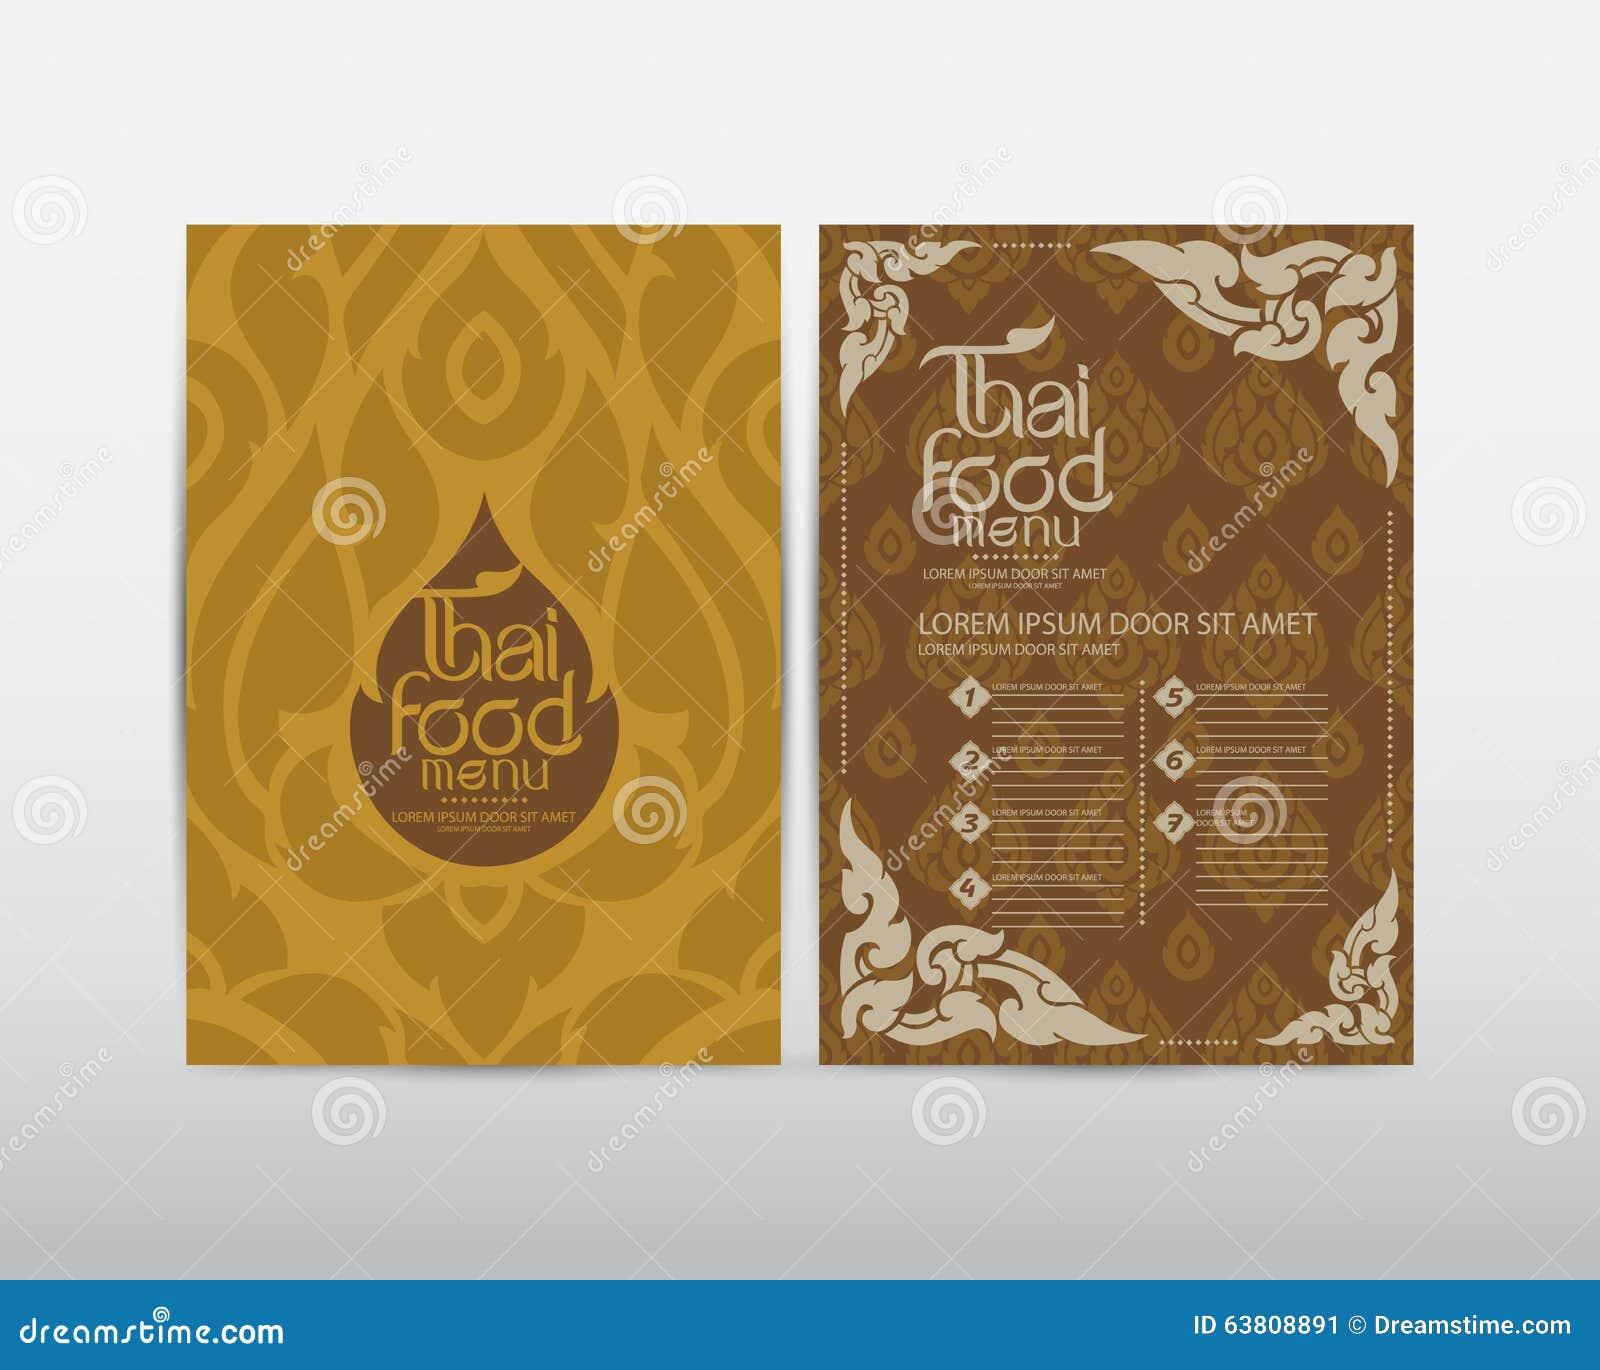 Thai art food menu design vector stock illustration for Artistic cuisine menu